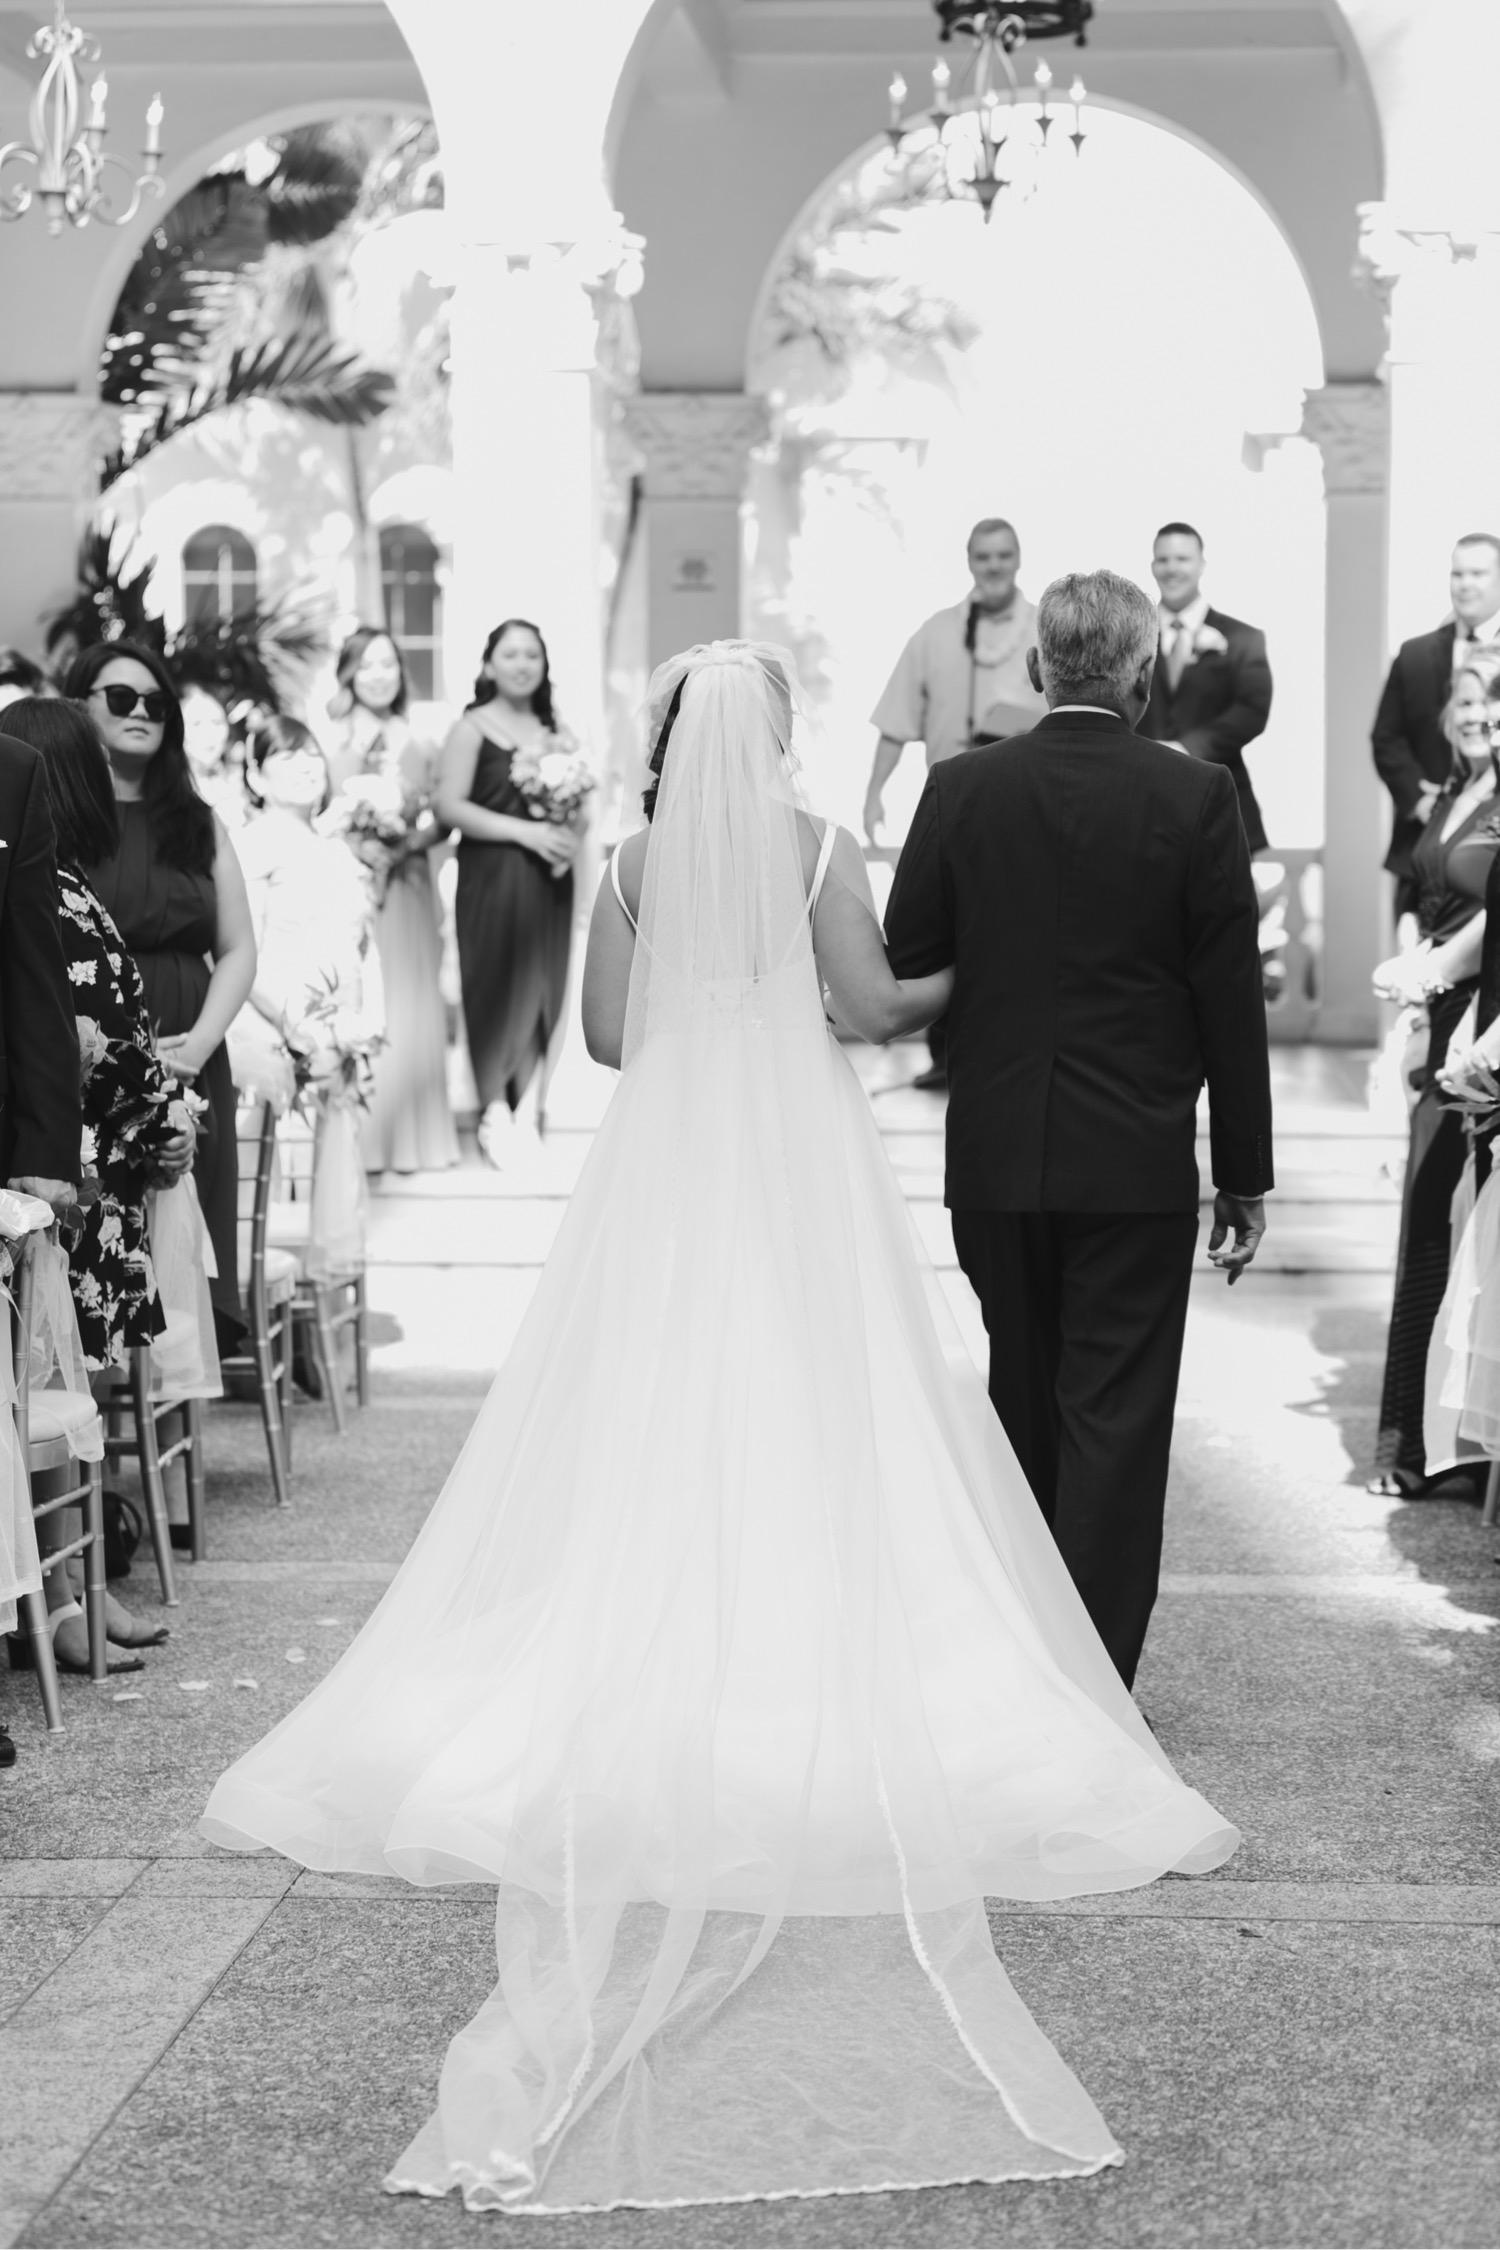 Julia_Hawaii_Groom_Ceremony_Honolulu_Wedding_Cafe_Bride_dad.jpg